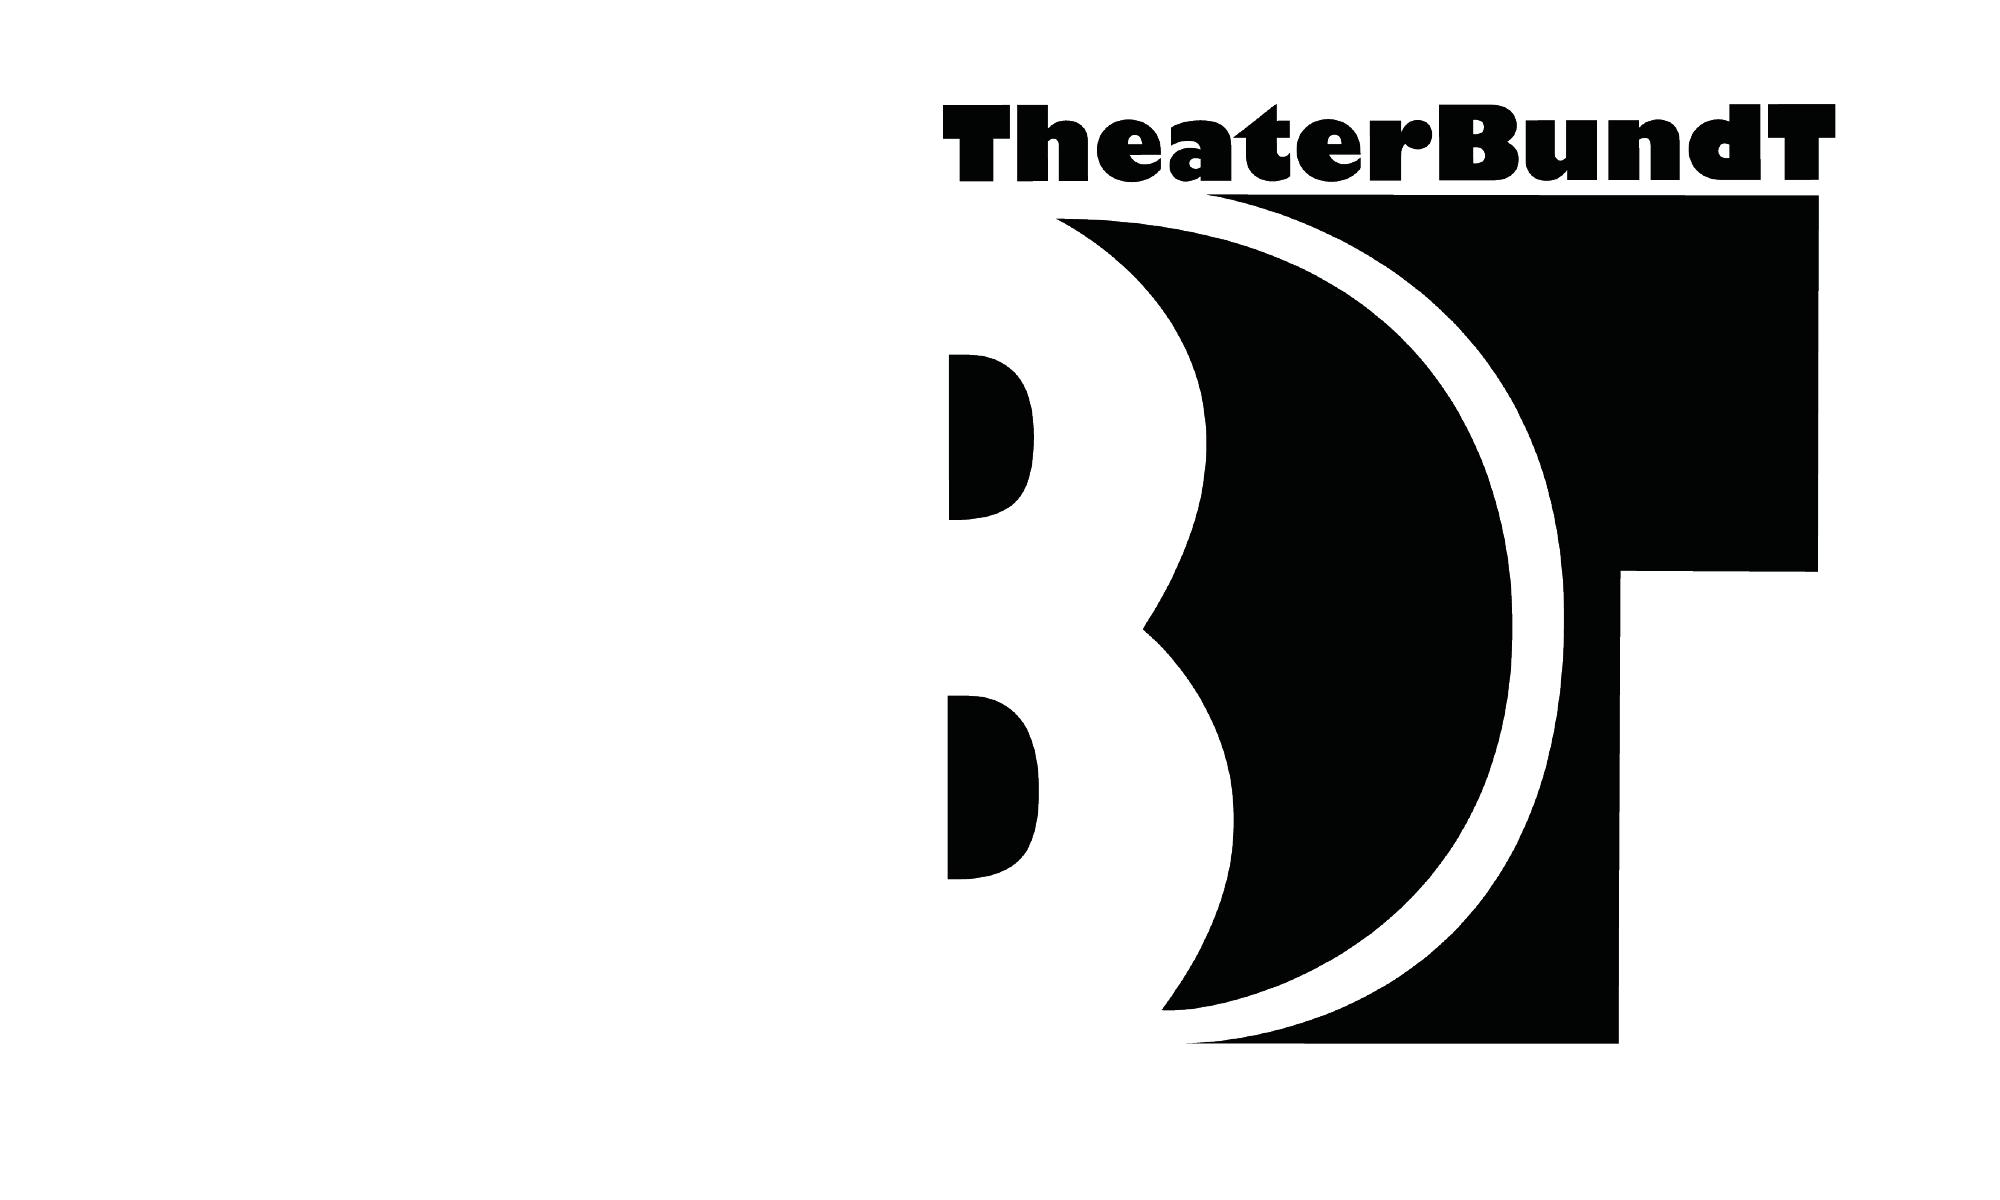 Theaterbundt